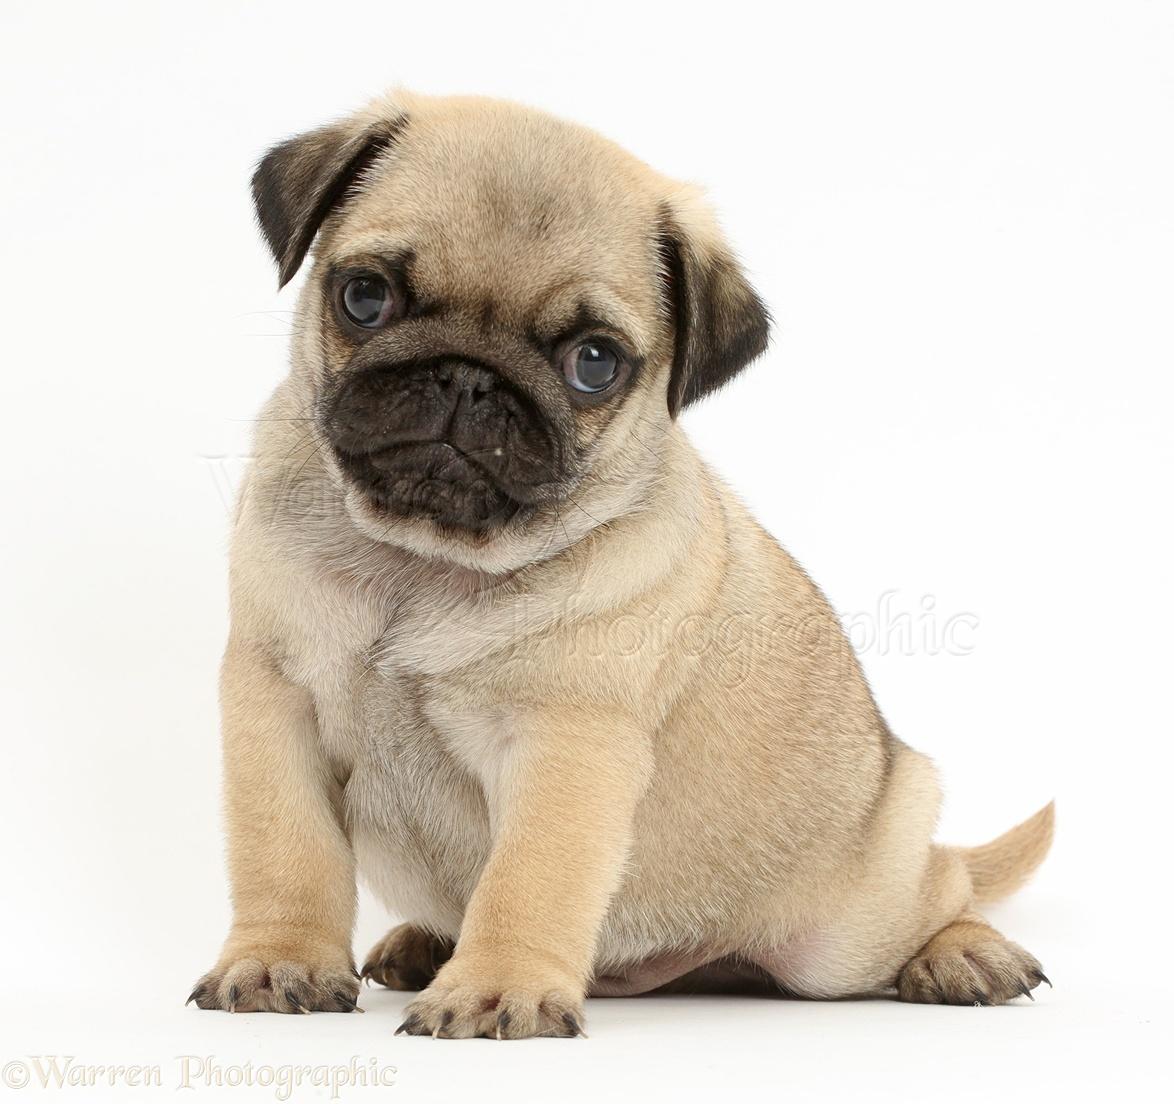 Pug puppy sentado